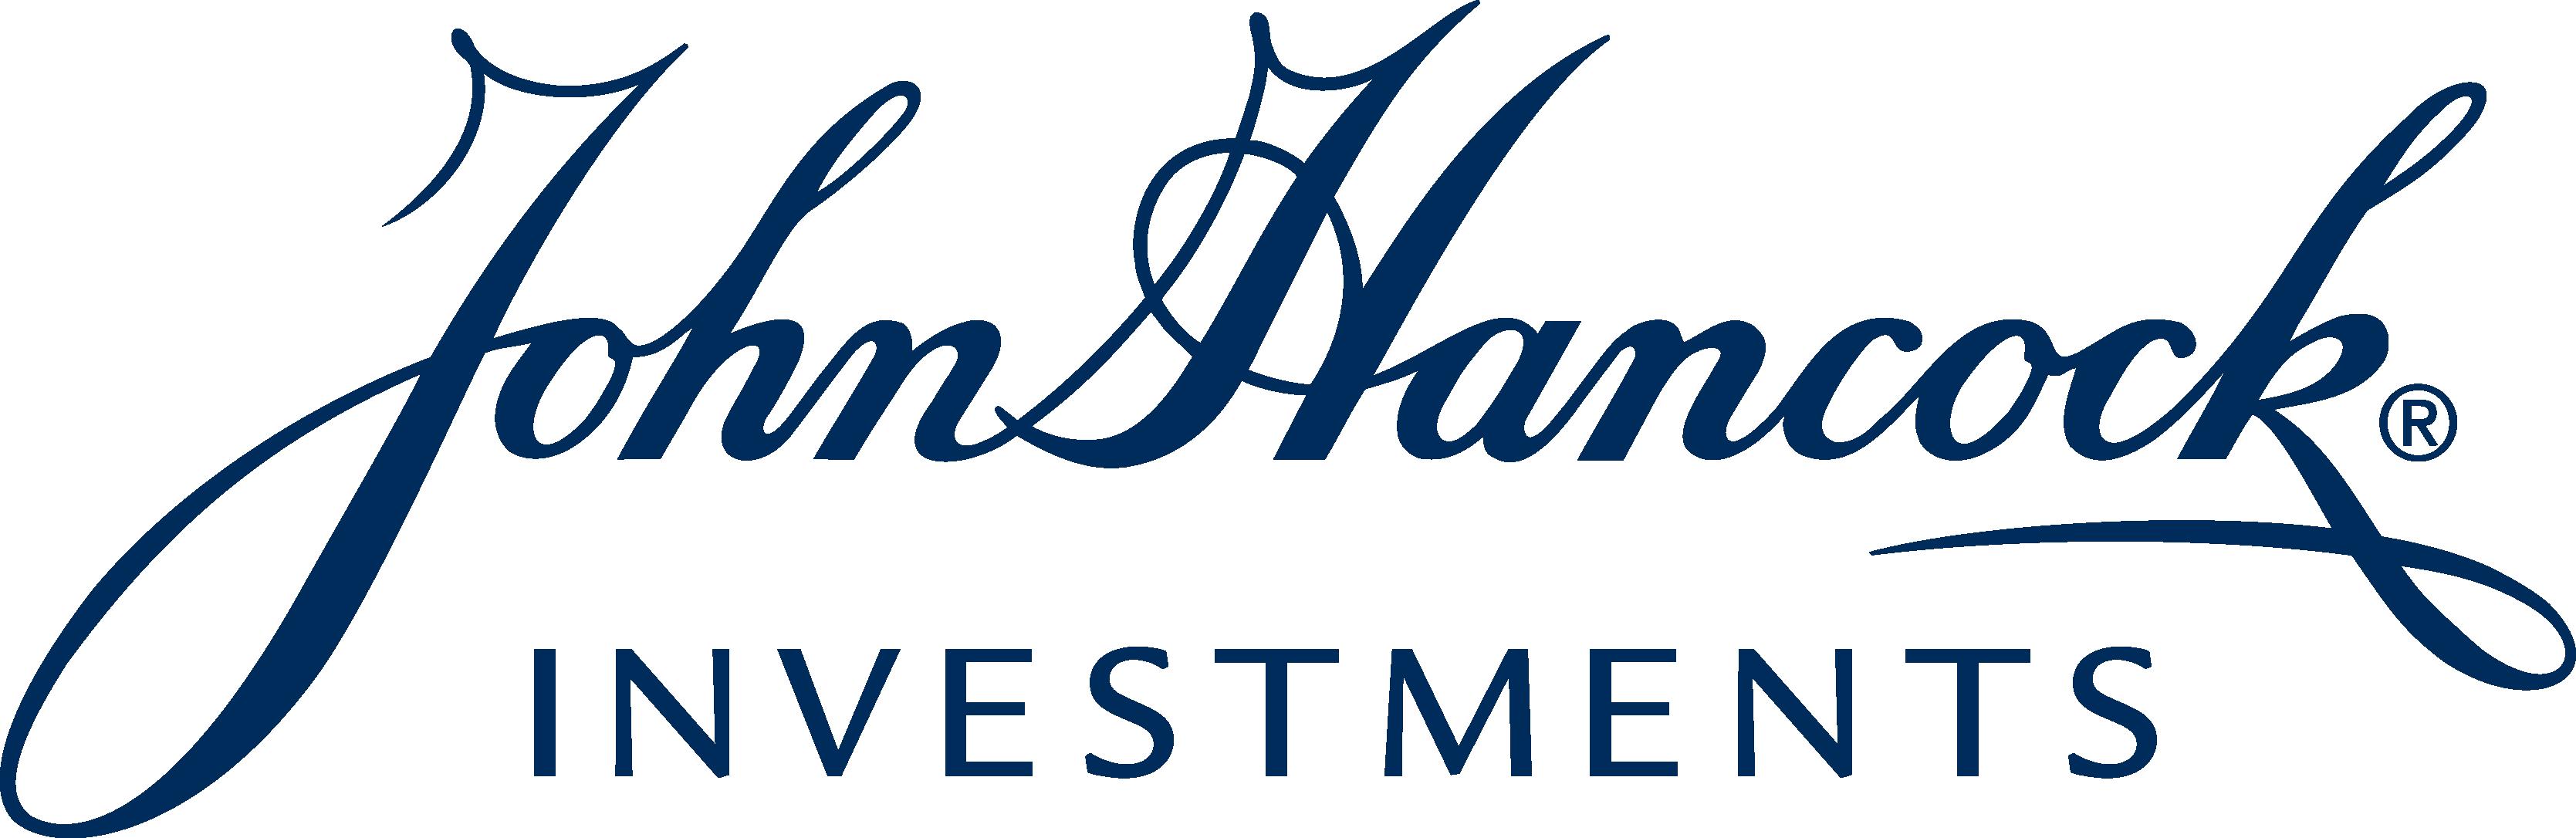 JohnHancock_Logo